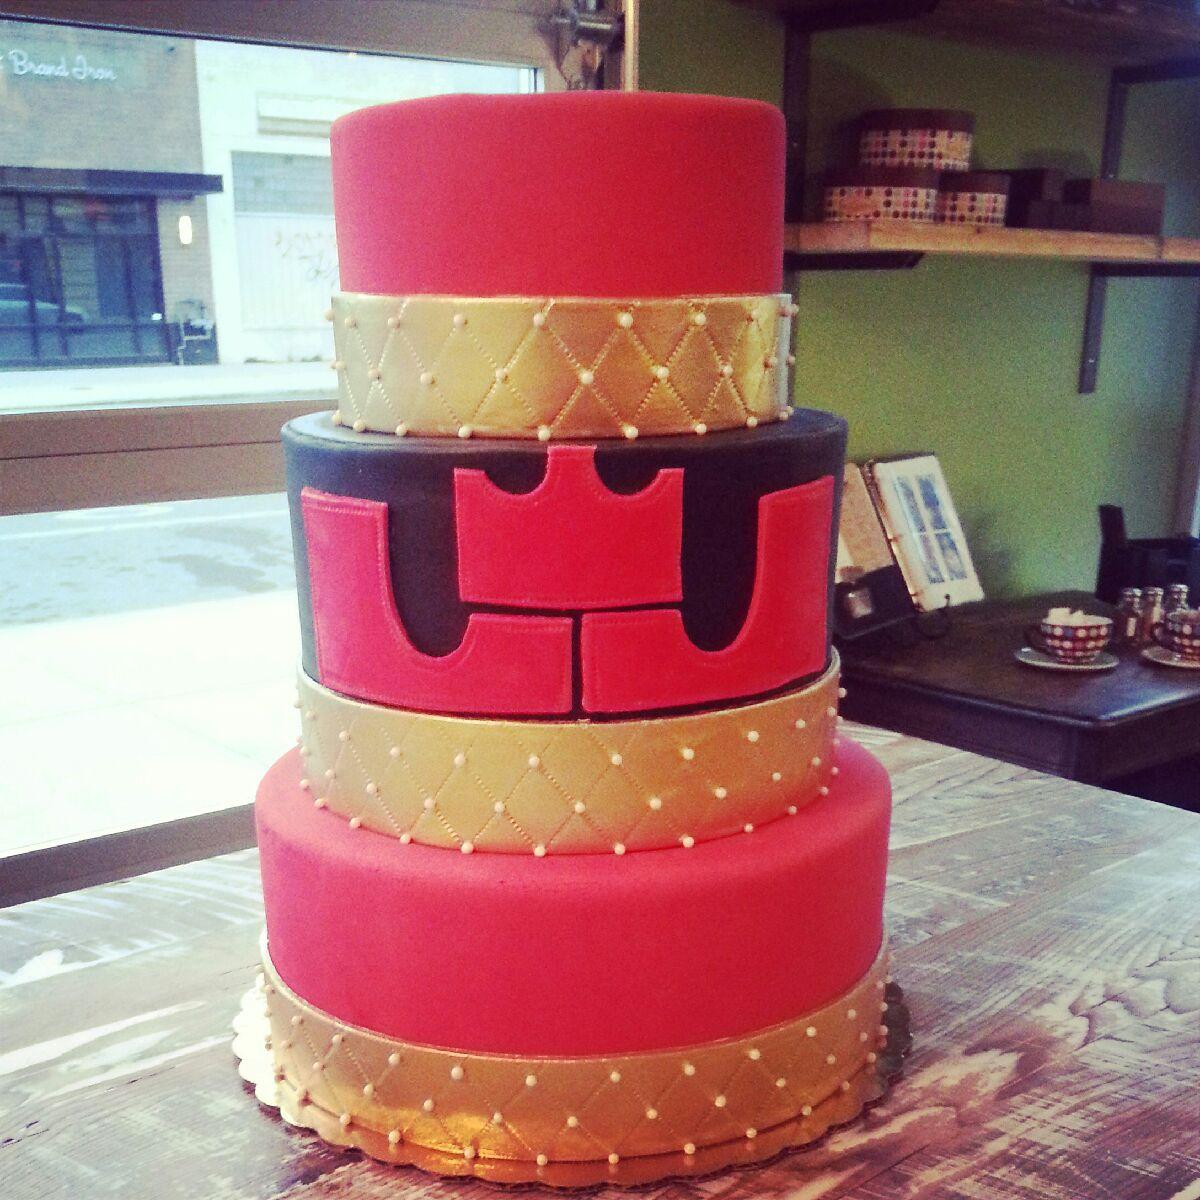 The Cake Sugarmill Made For Lebron James' Birthday On Monday (sugarmill  Photo)